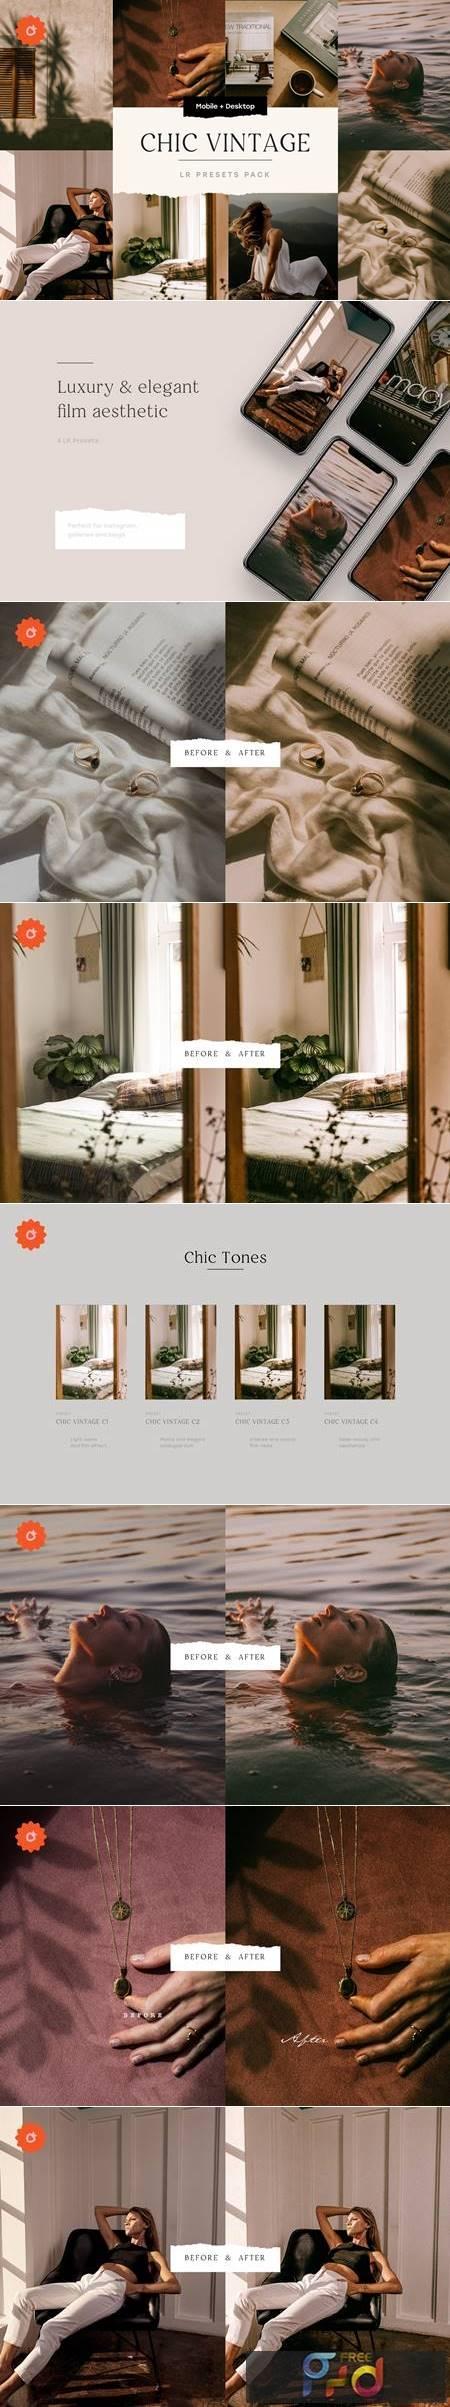 4 Chic Lightroom Presets 5186923 1